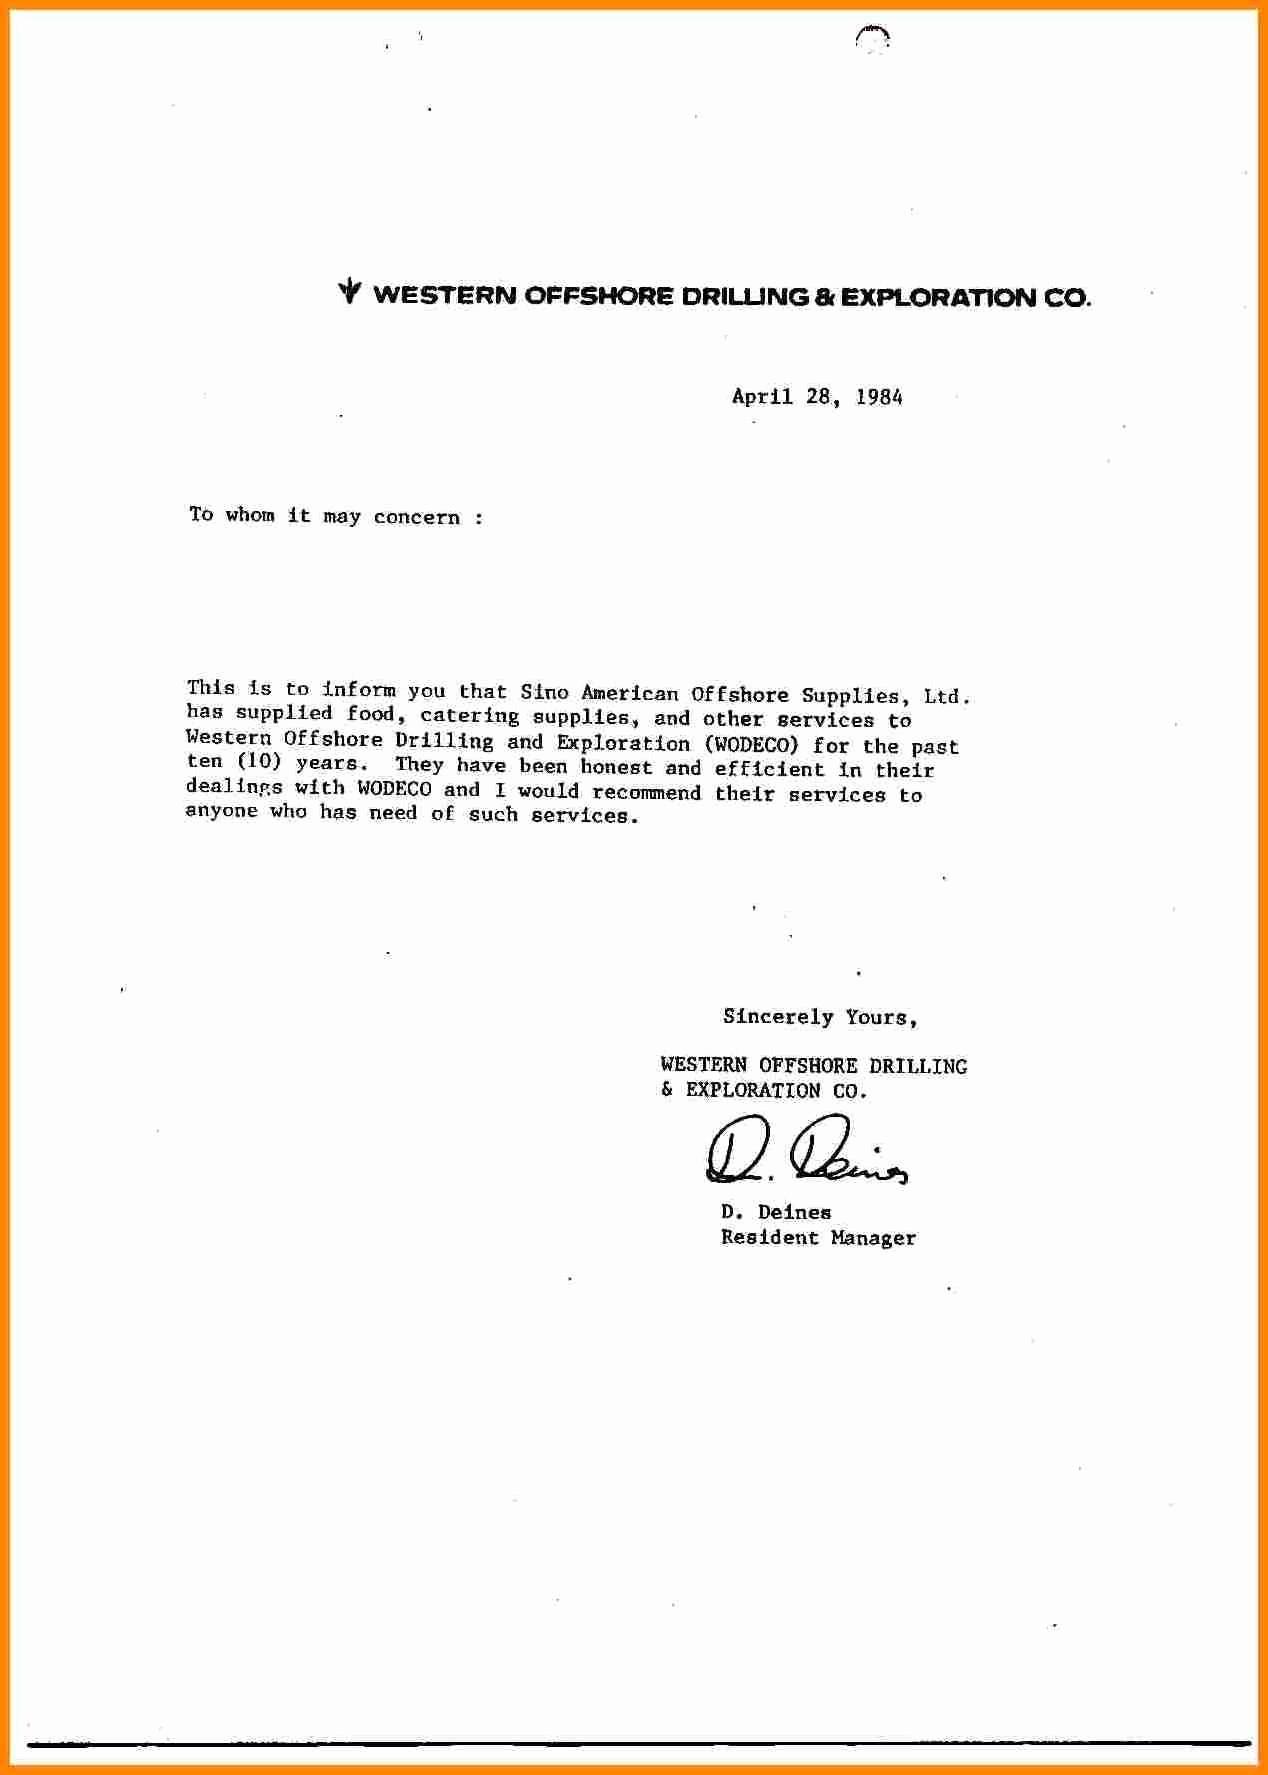 Letters Of Recommendation format Samples Fresh 9 General Letter Of Re Mendation Samples